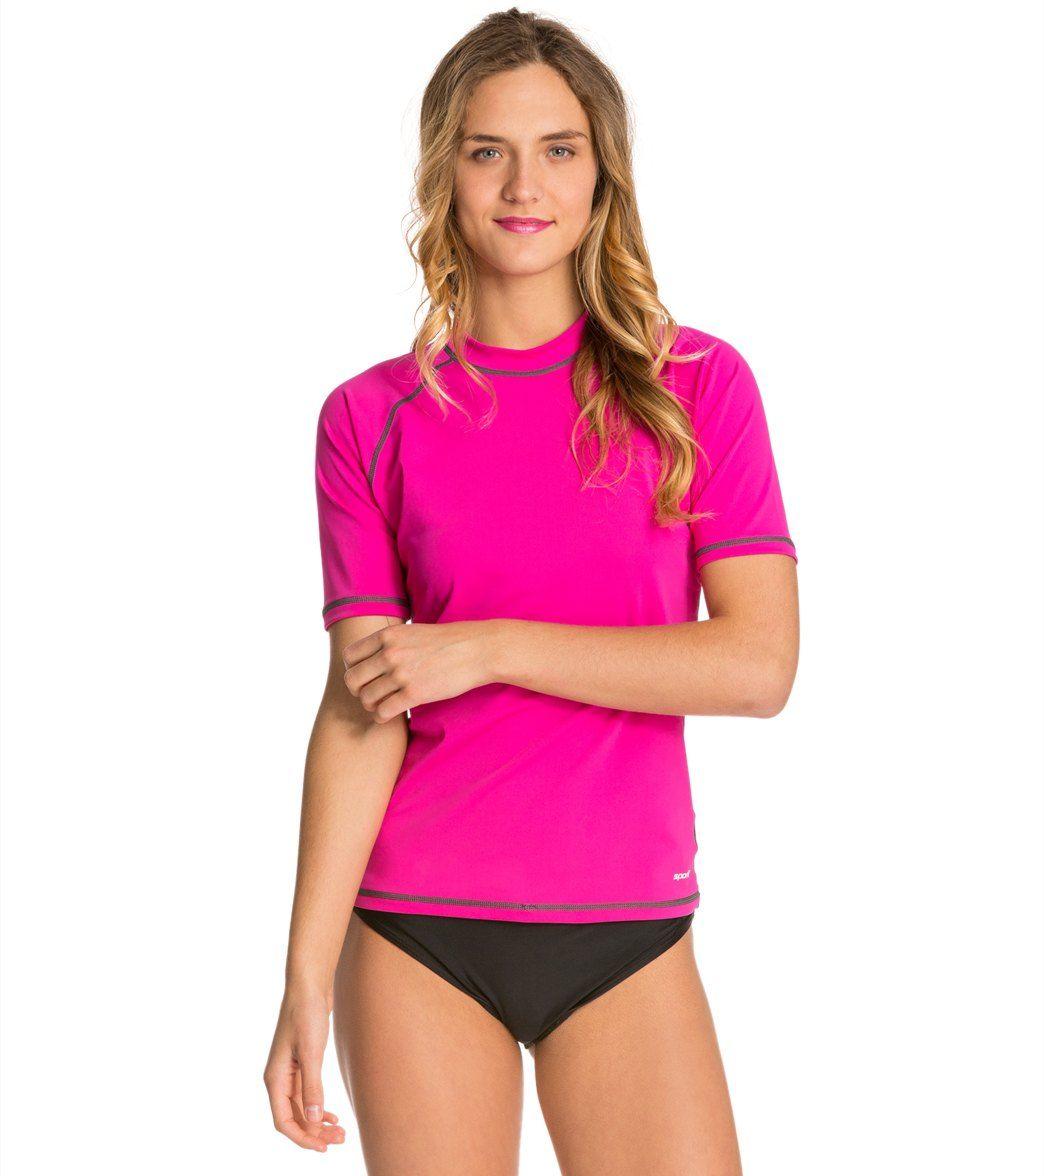 76d527690bc Sporti Women's S/S Swim Shirt at SwimOutlet.com | Wish List